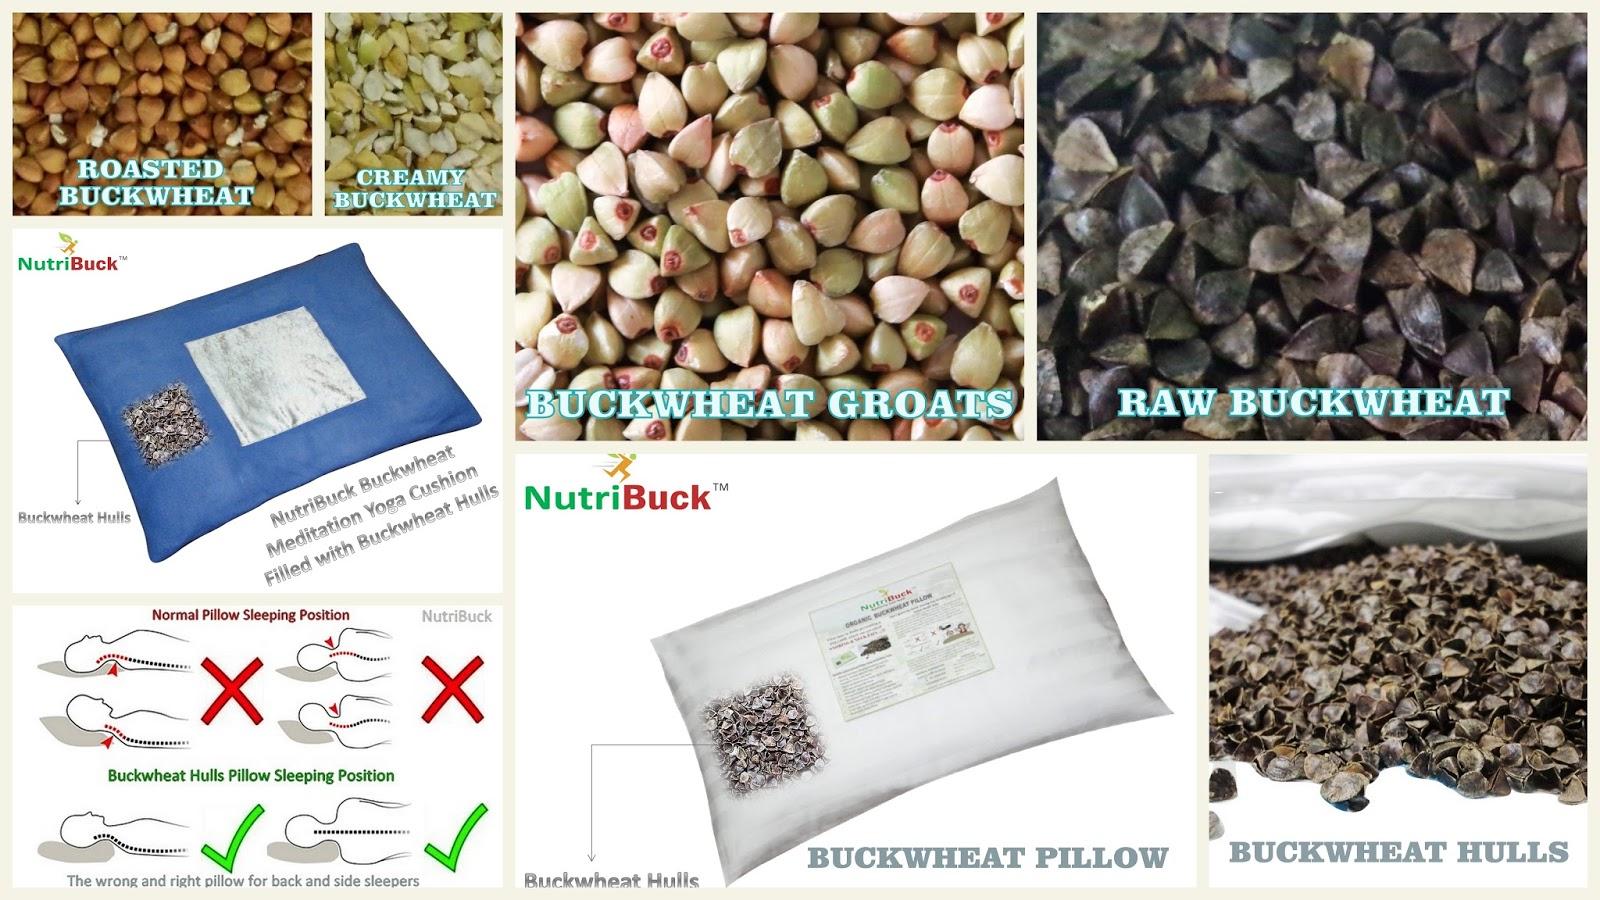 Buckwheat Pillow Case | Buckwheat Pillow Benefits | Buckwheat Pillow Singapore